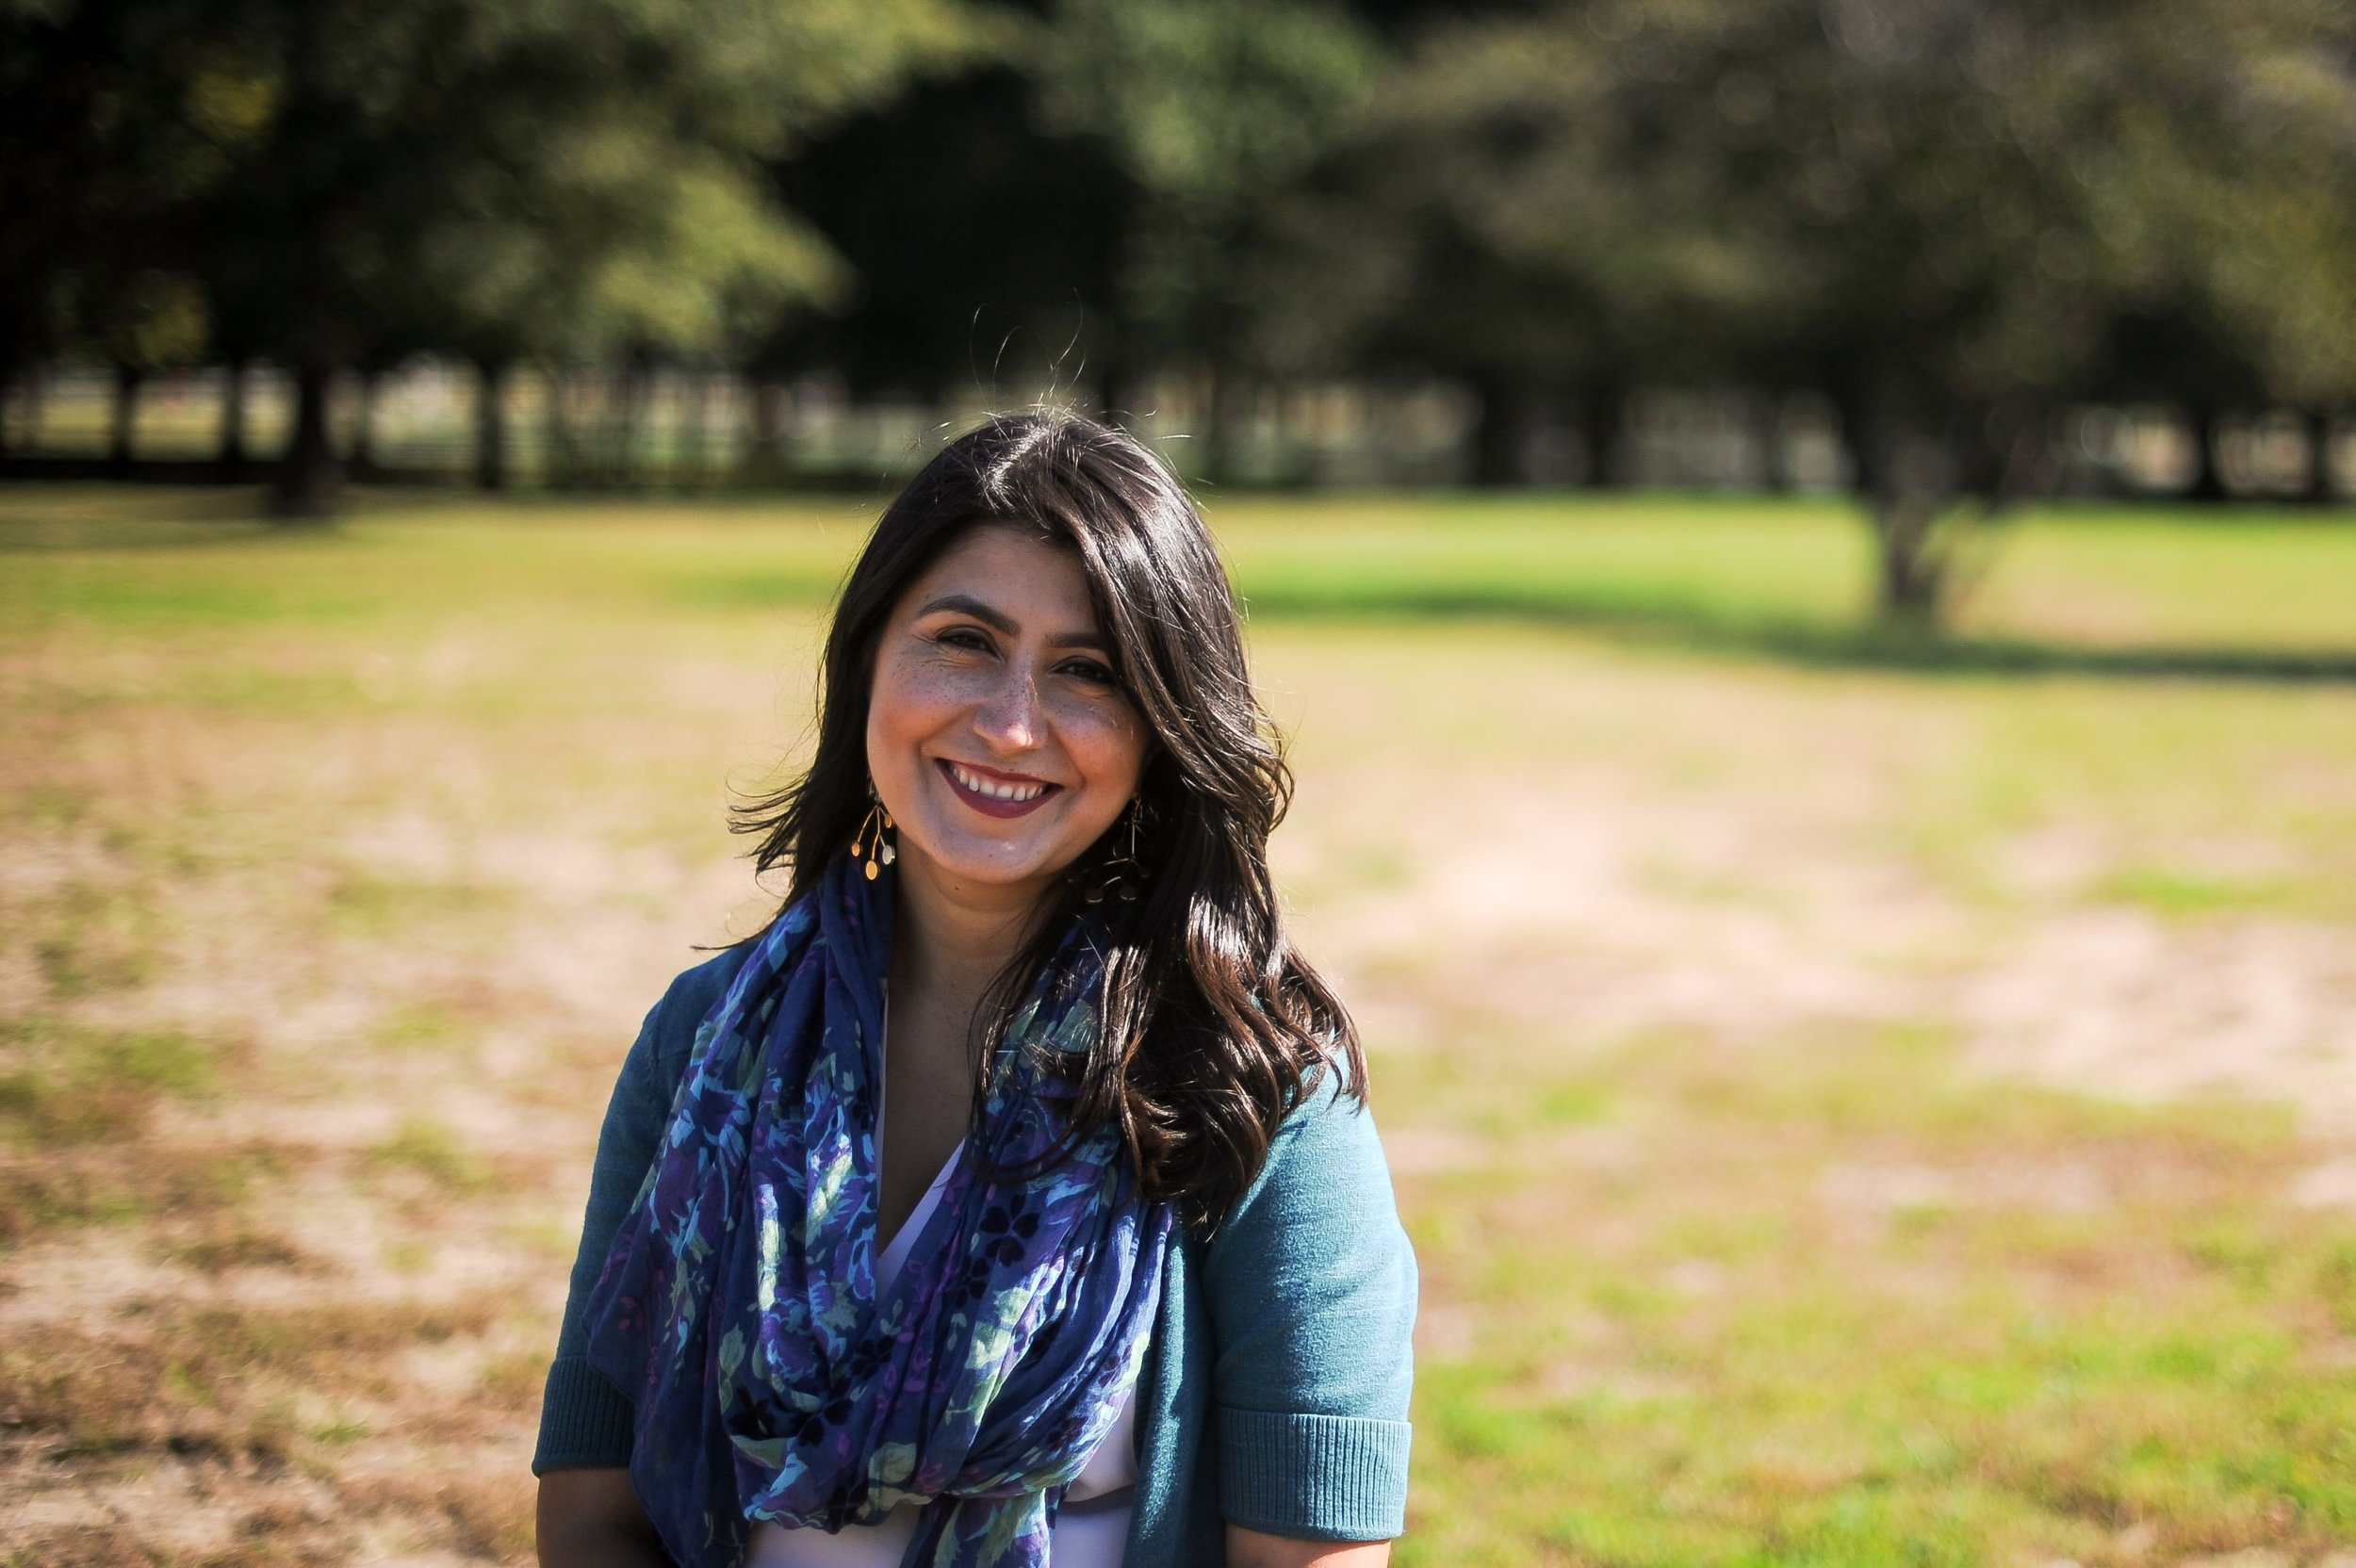 State Senator-elect Jessica Ramos will chair the Senate Labor Committee. Photo courtesy of Jessica Ramos' office.